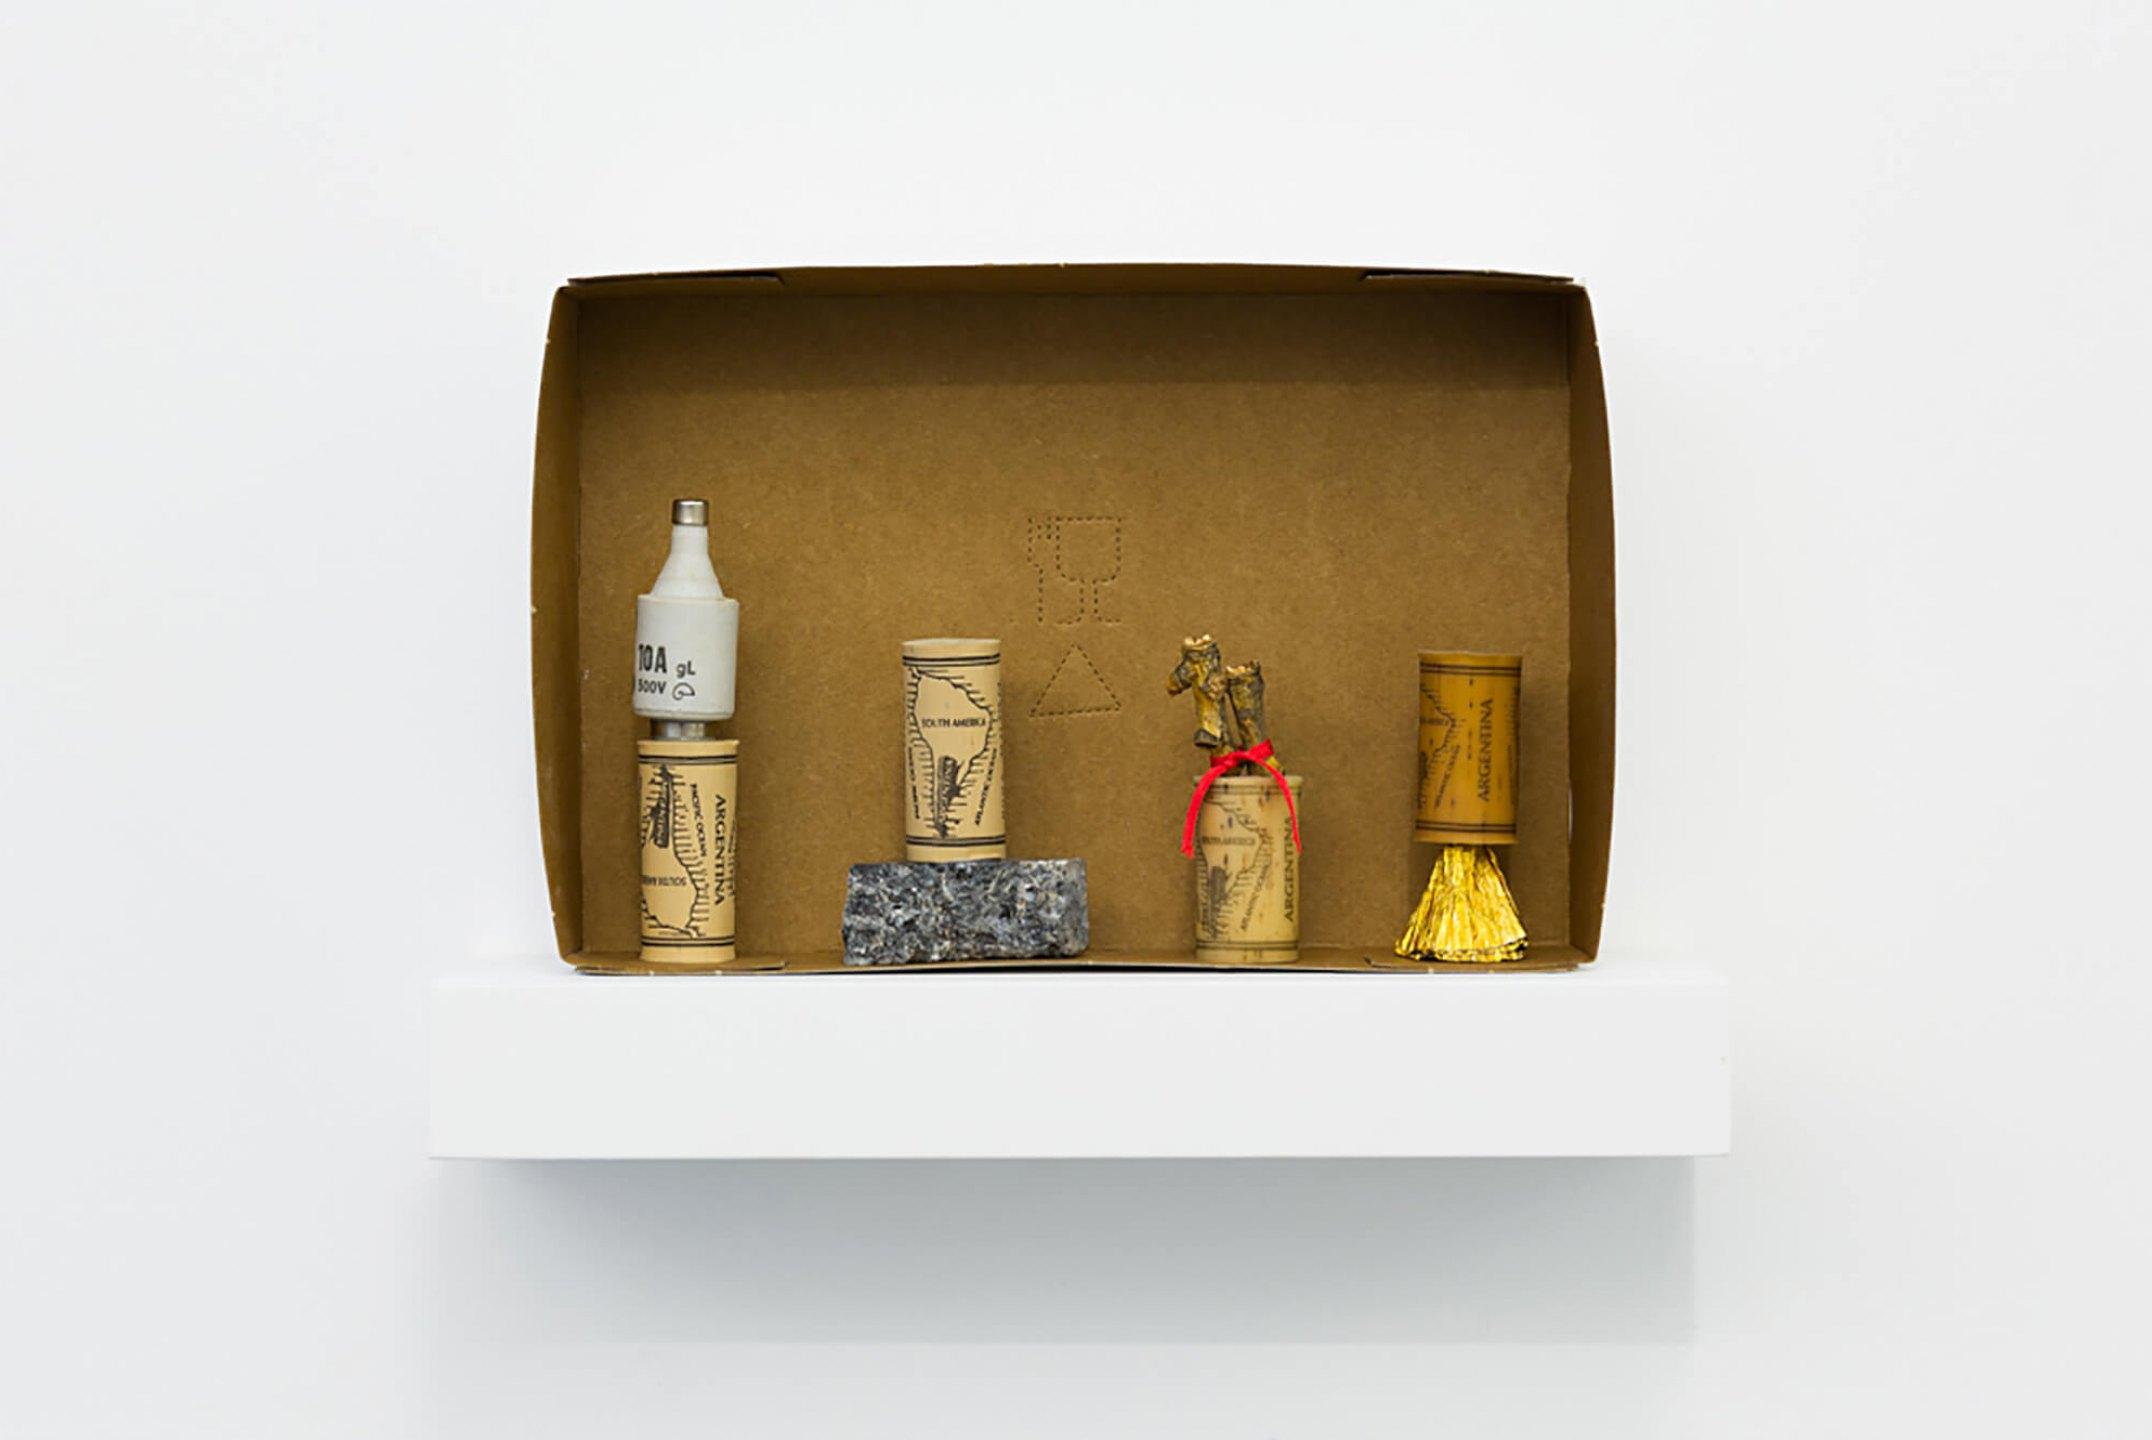 Runo Lagomarsino, <em>El Descubrimiento de America (Para Robert Filliou),</em> 2014, wine stopper, stone, fuse, tree branch, tape, golden paper and carboard box, 14,5 × 21 × 4,5 cm - Mendes Wood DM